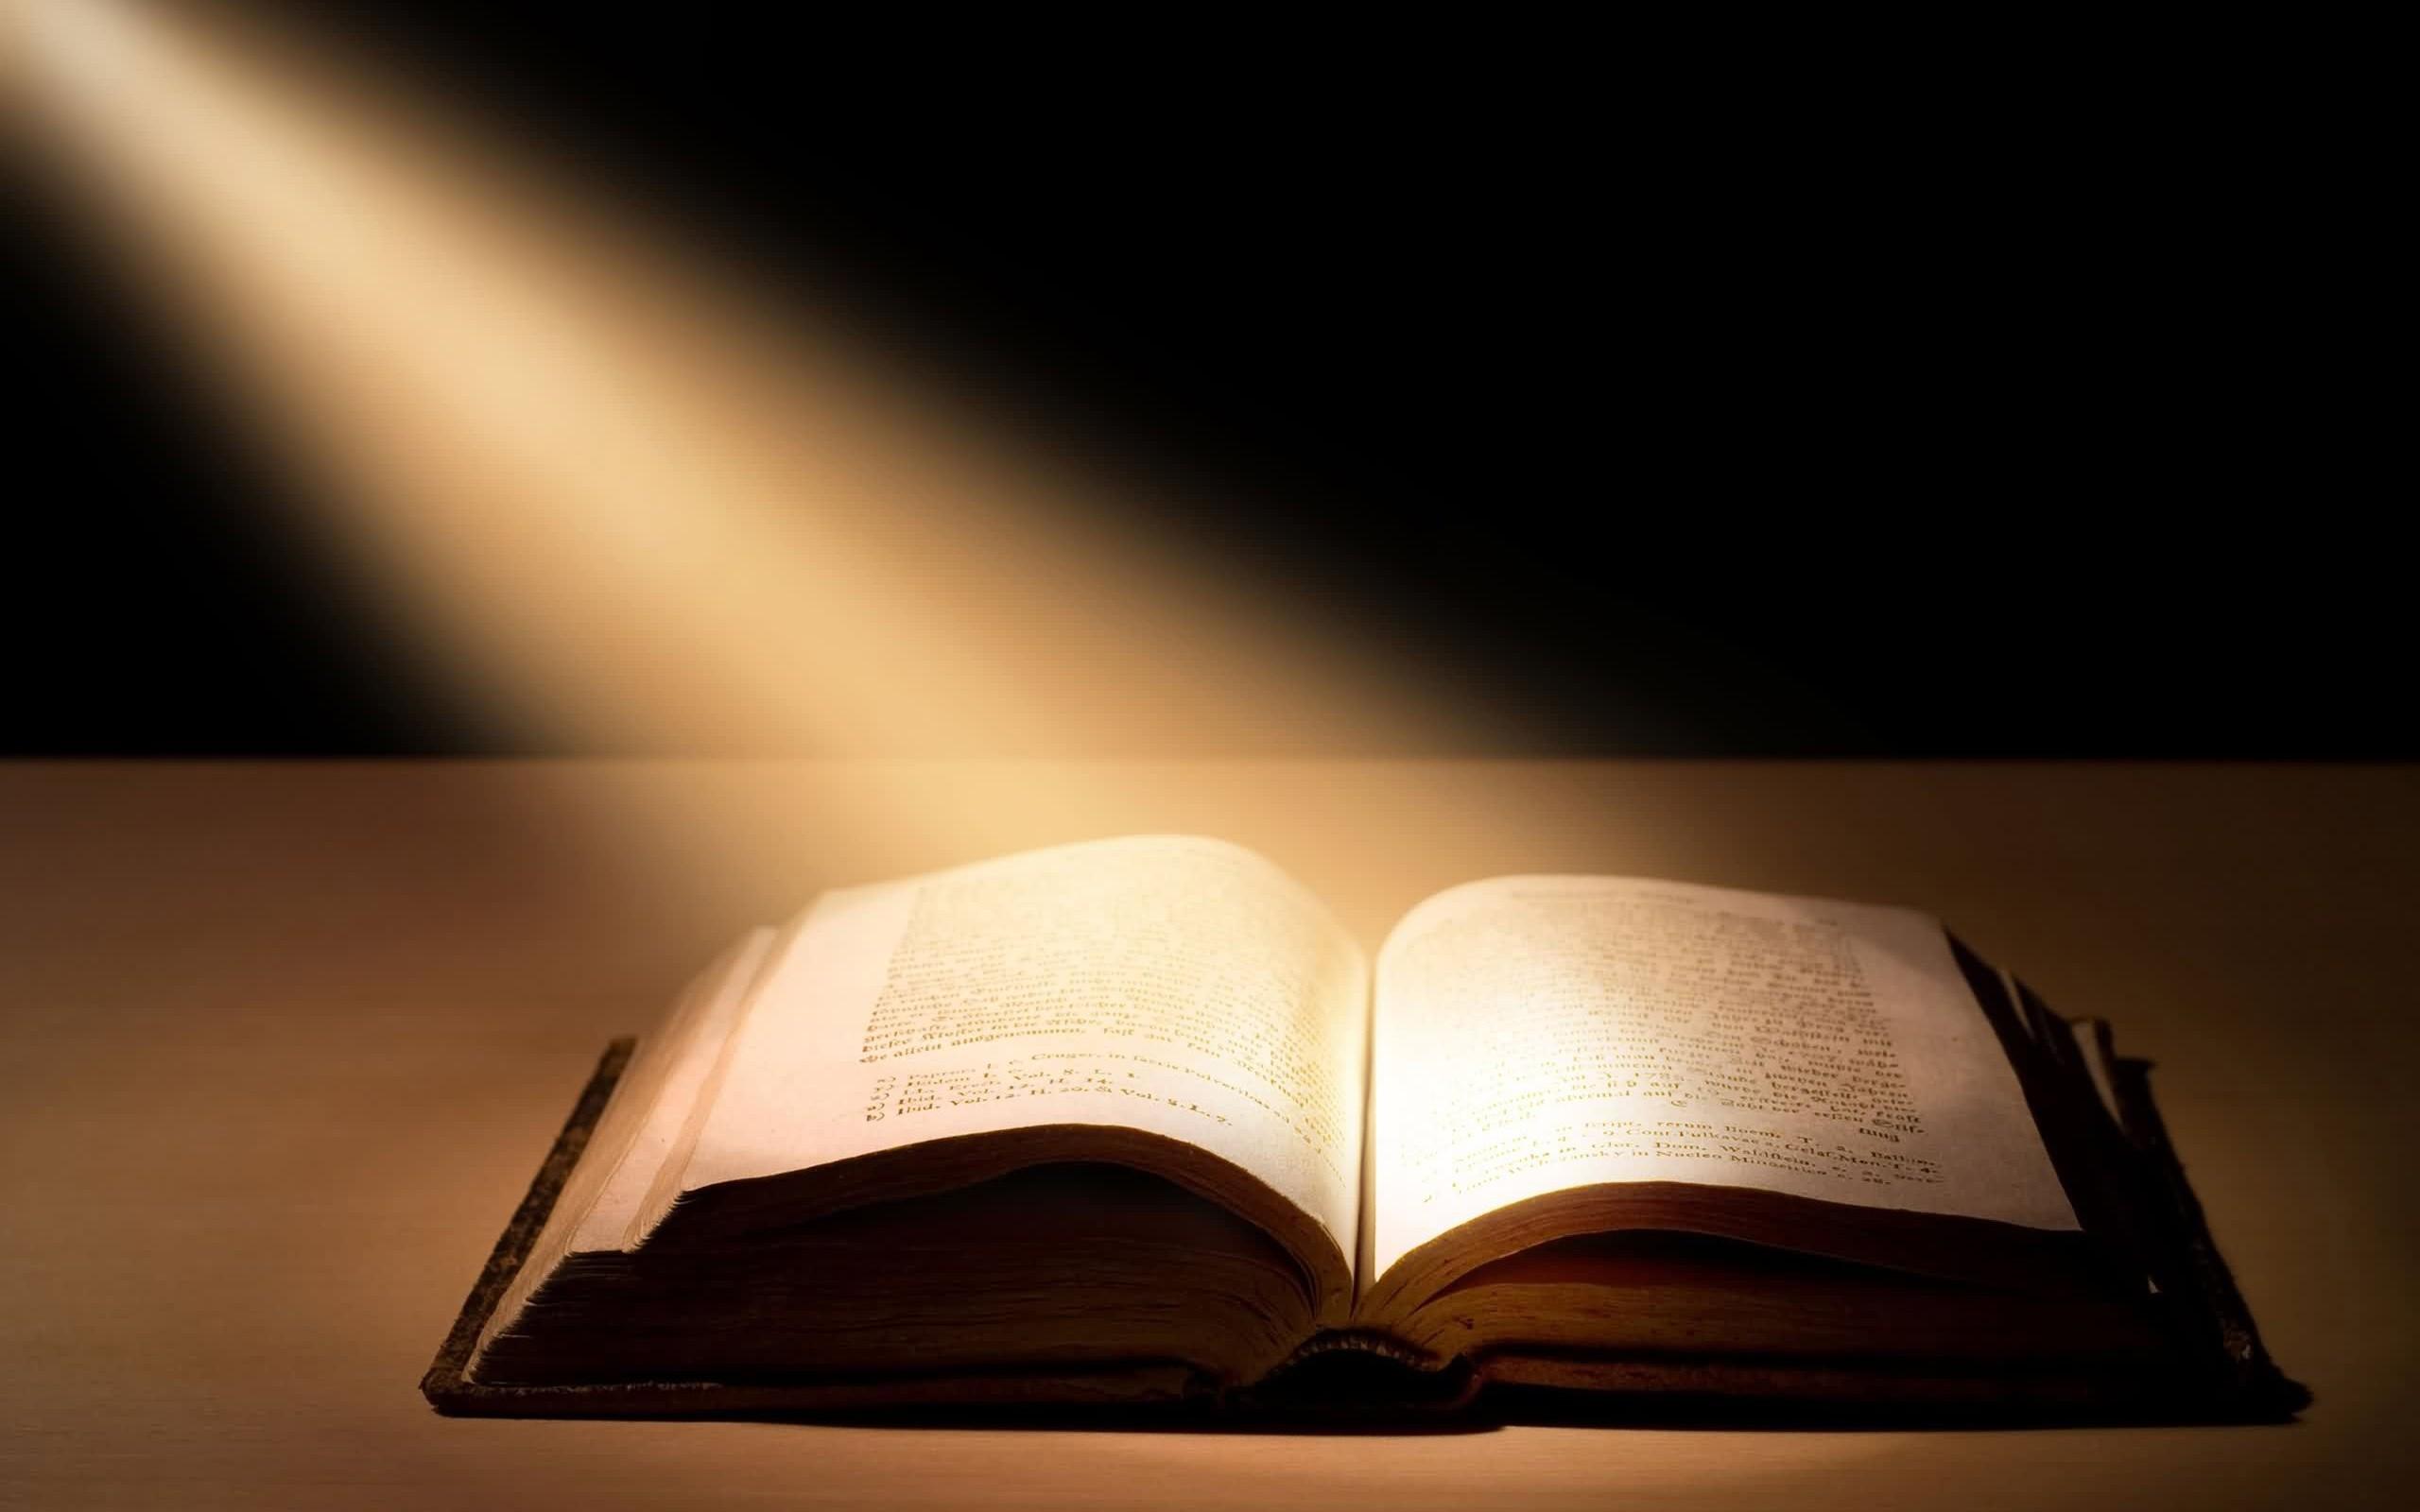 Download Bible Quotes Wallpaper Religious Desktop Backgrounds 55 Images